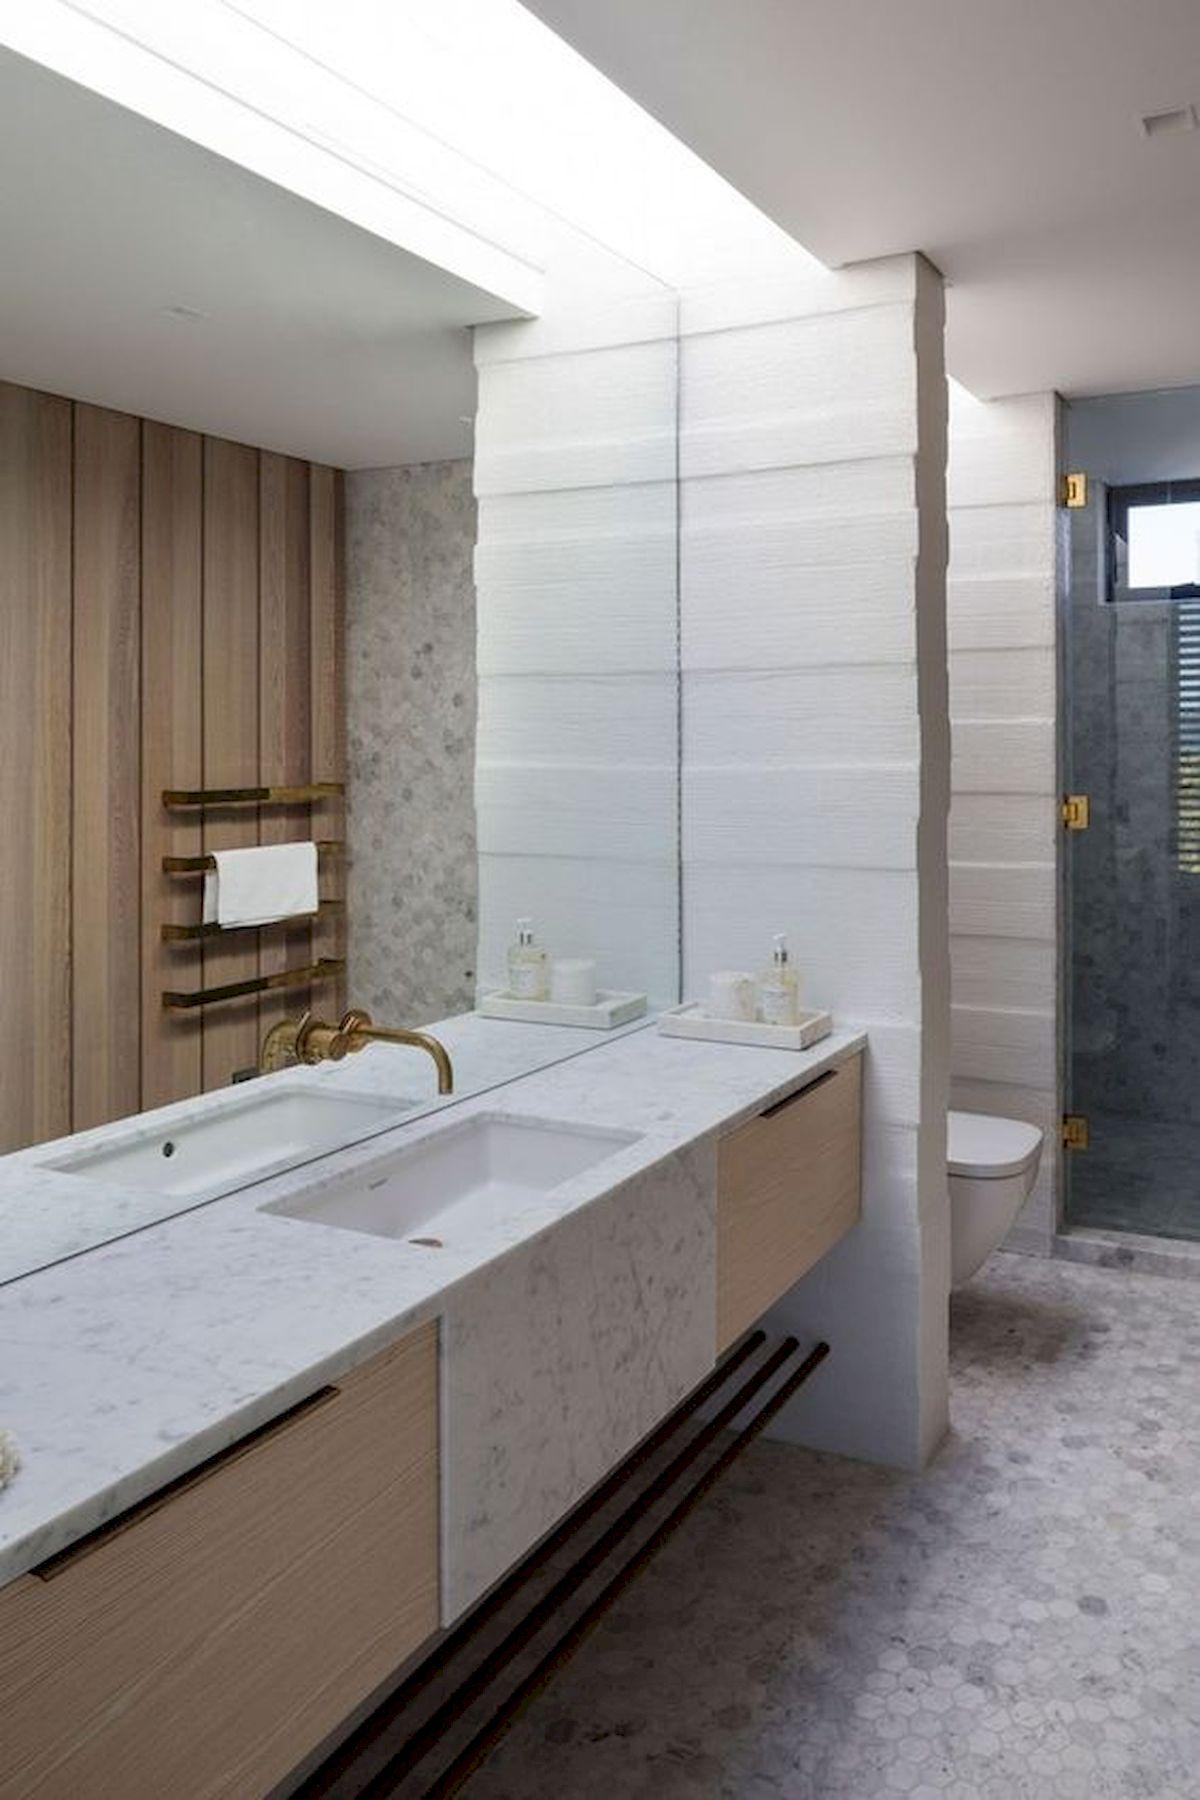 26 Easy And Creative DIY Mirror Ideas To Decorate Your Bathroom (2)